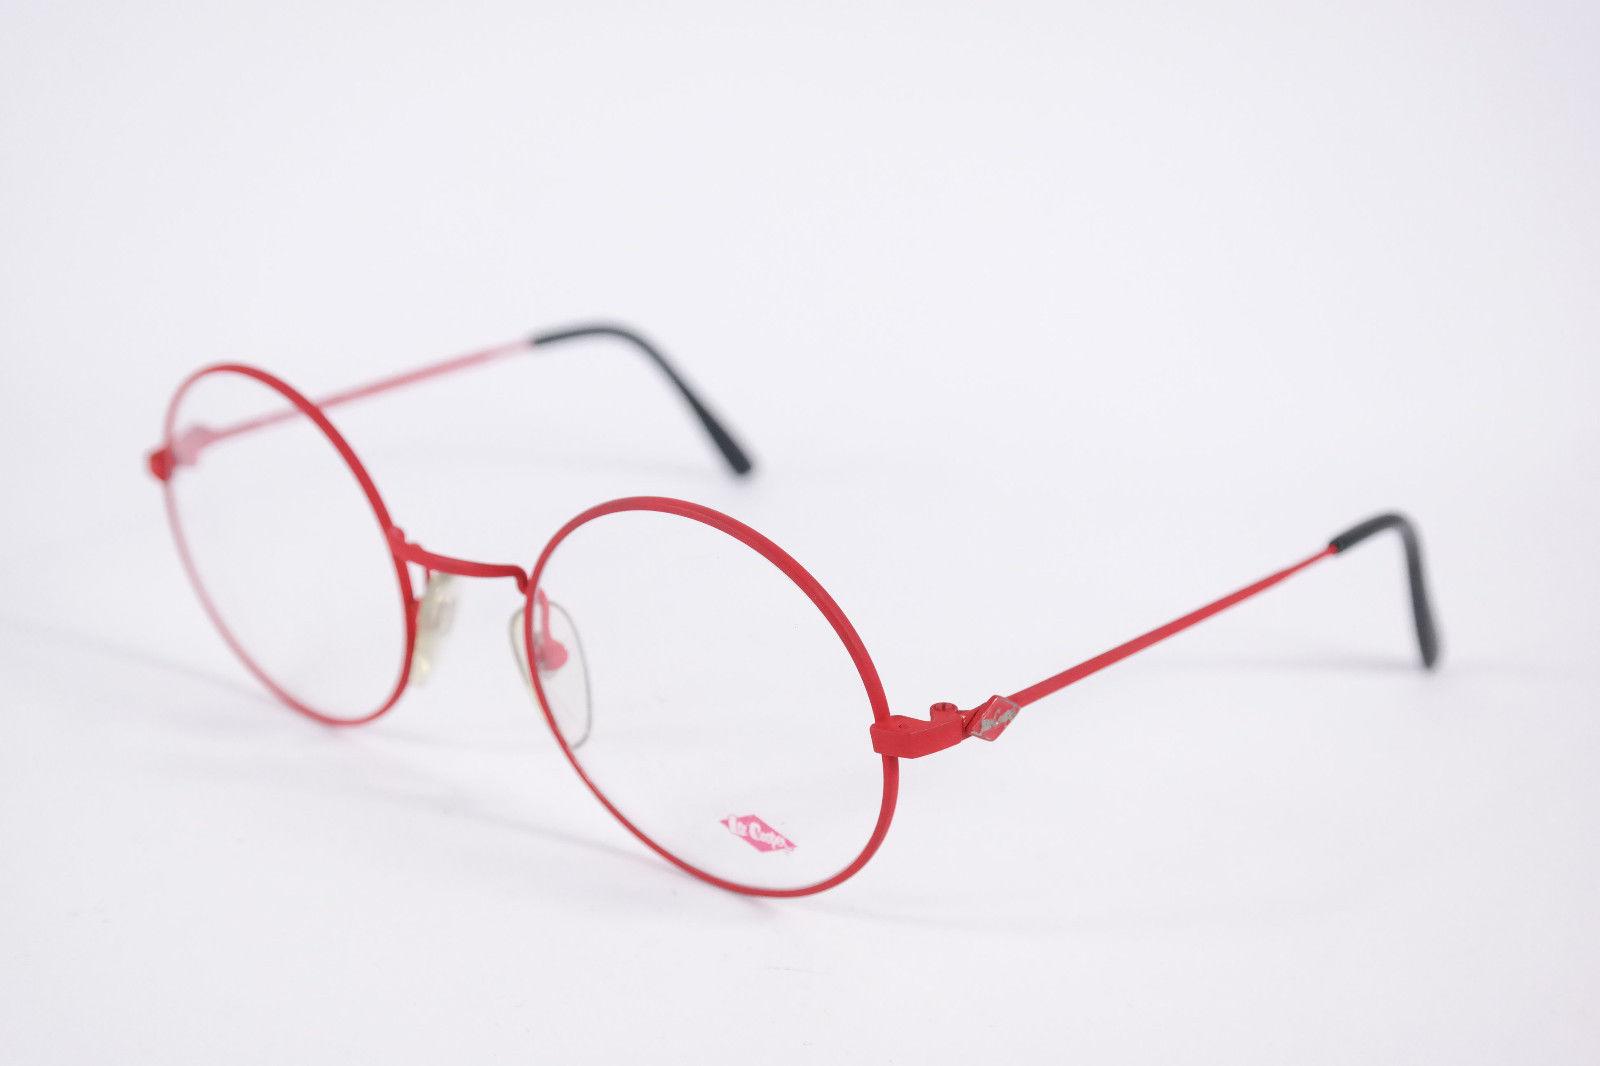 Authentic Lee Cooper Dallas Red Black Round Eyeglasses France Eyewear Unisex image 3